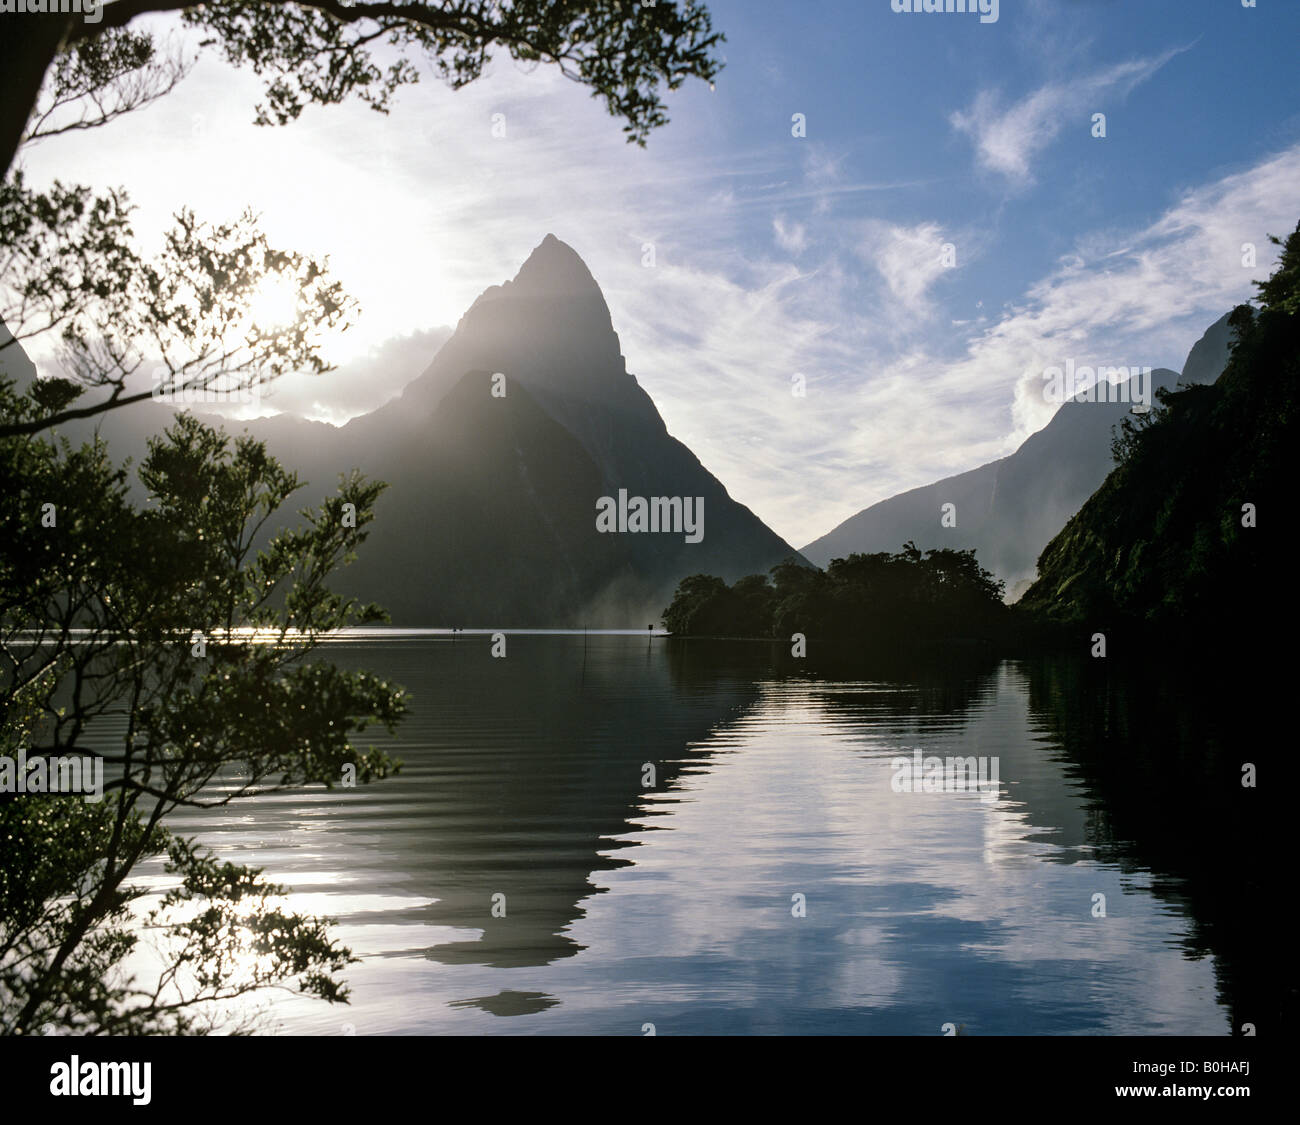 Mitre Peak, Milford Sound, Fjord Gebiet, Nationalpark, Südinsel, Neuseeland Stockbild